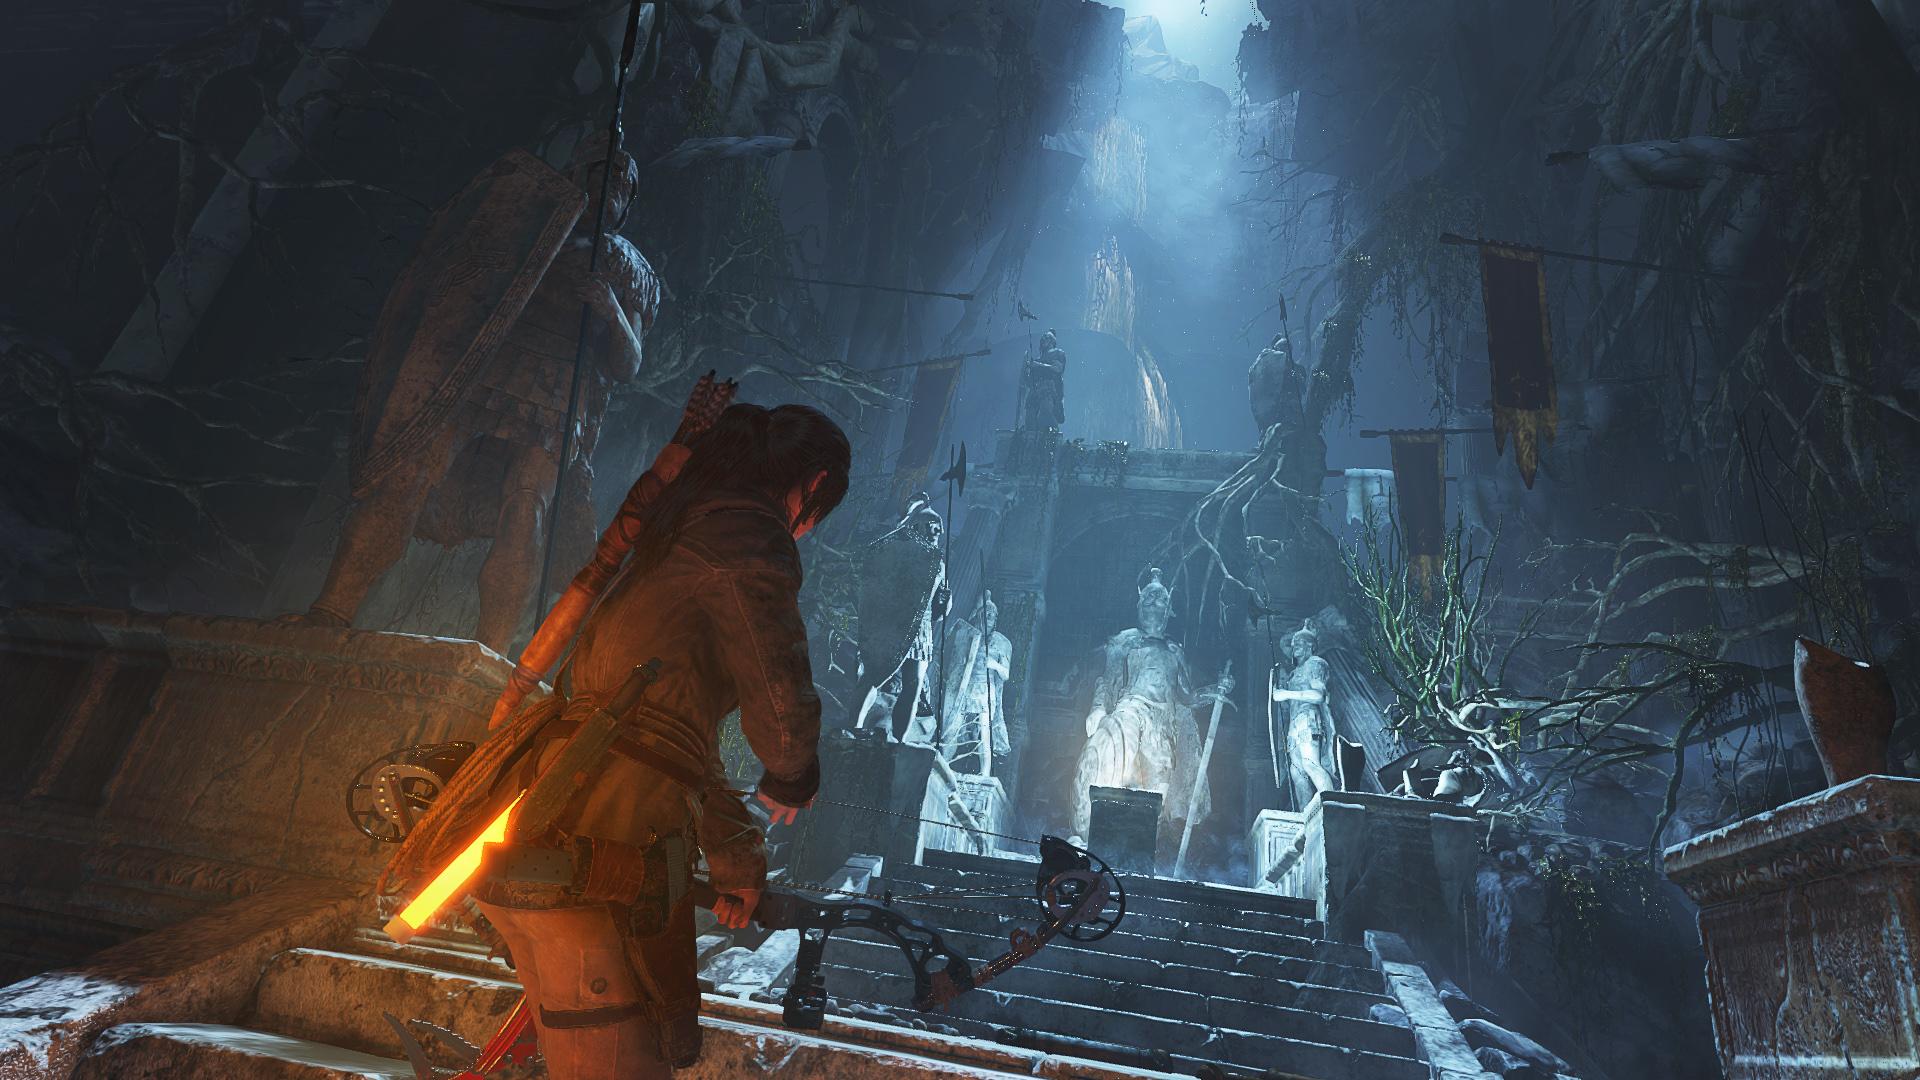 ¡Así es el cooperativo deRise of the Tomb Raider! #Video